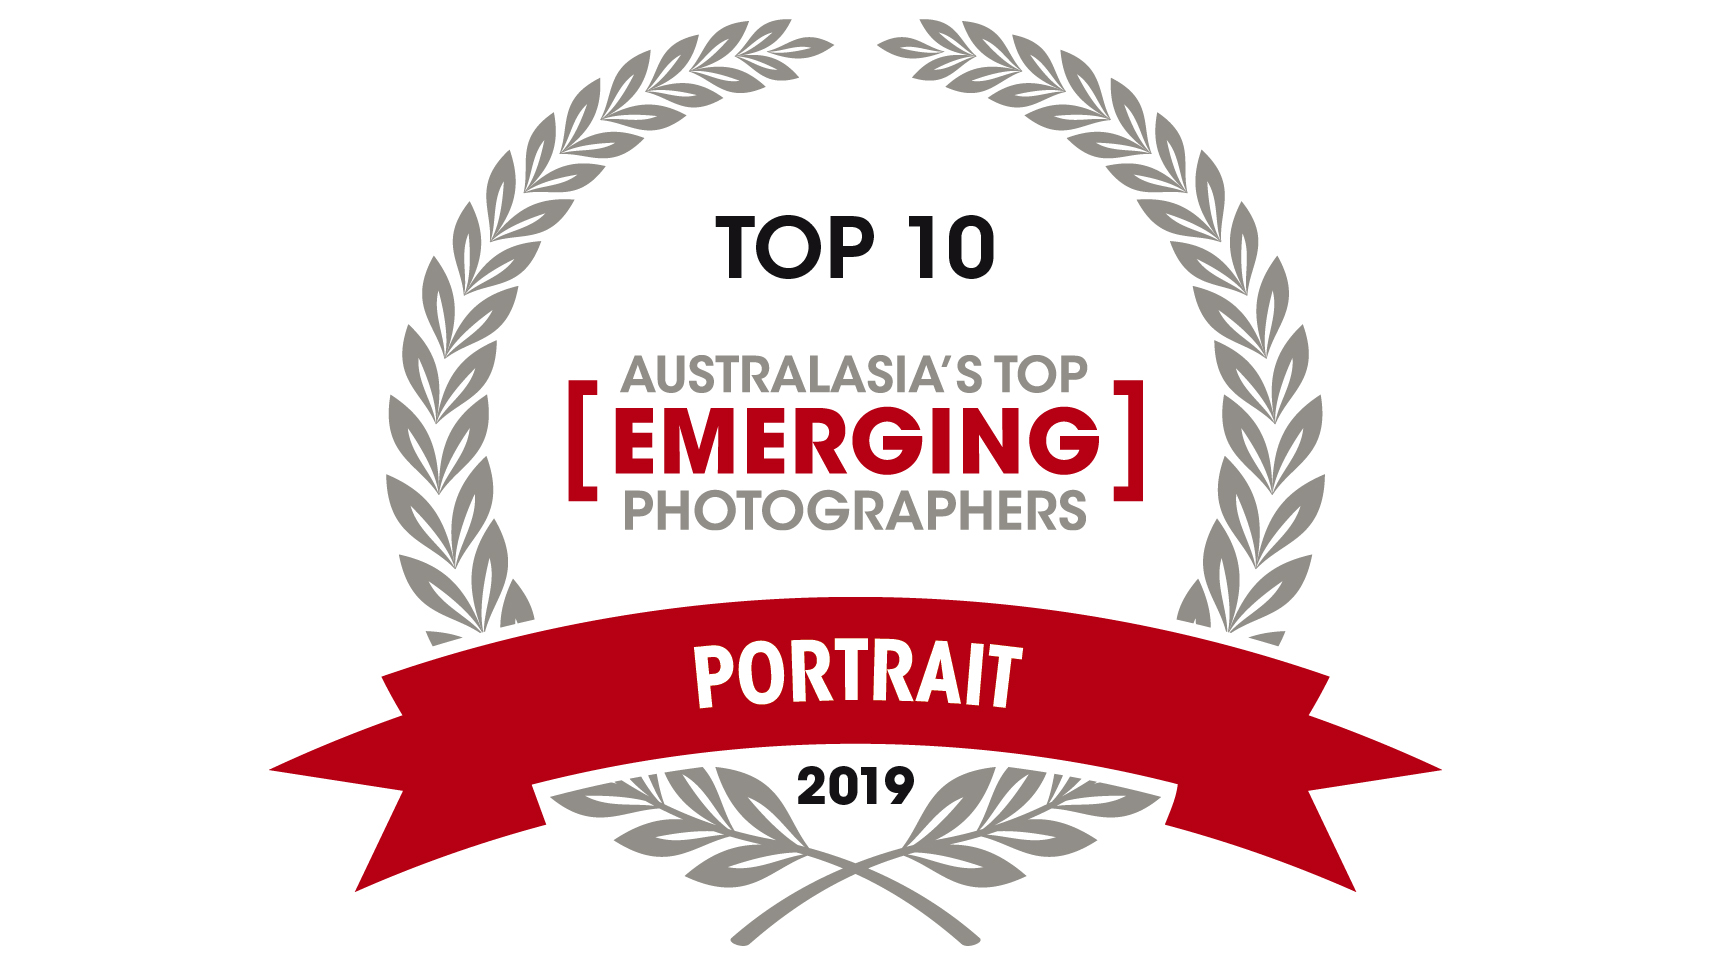 Australiasia's Top Emerging Photographer 2019